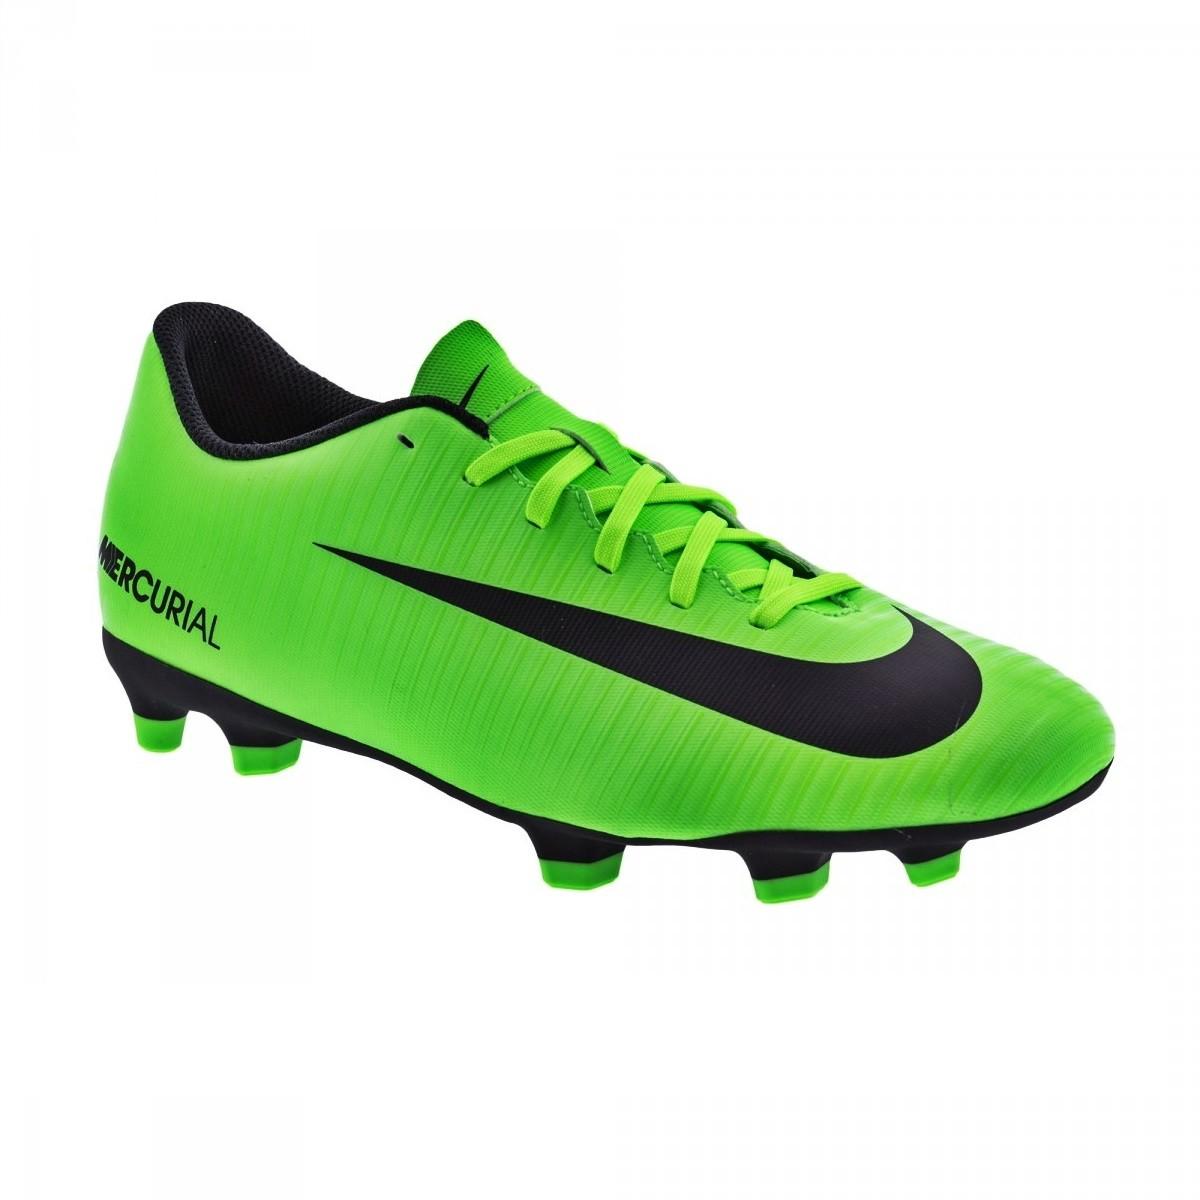 aea106ec70 ... Worldwide Online Retailer List Chuteira Campo Nike Mercurial Vortex III  FG ...